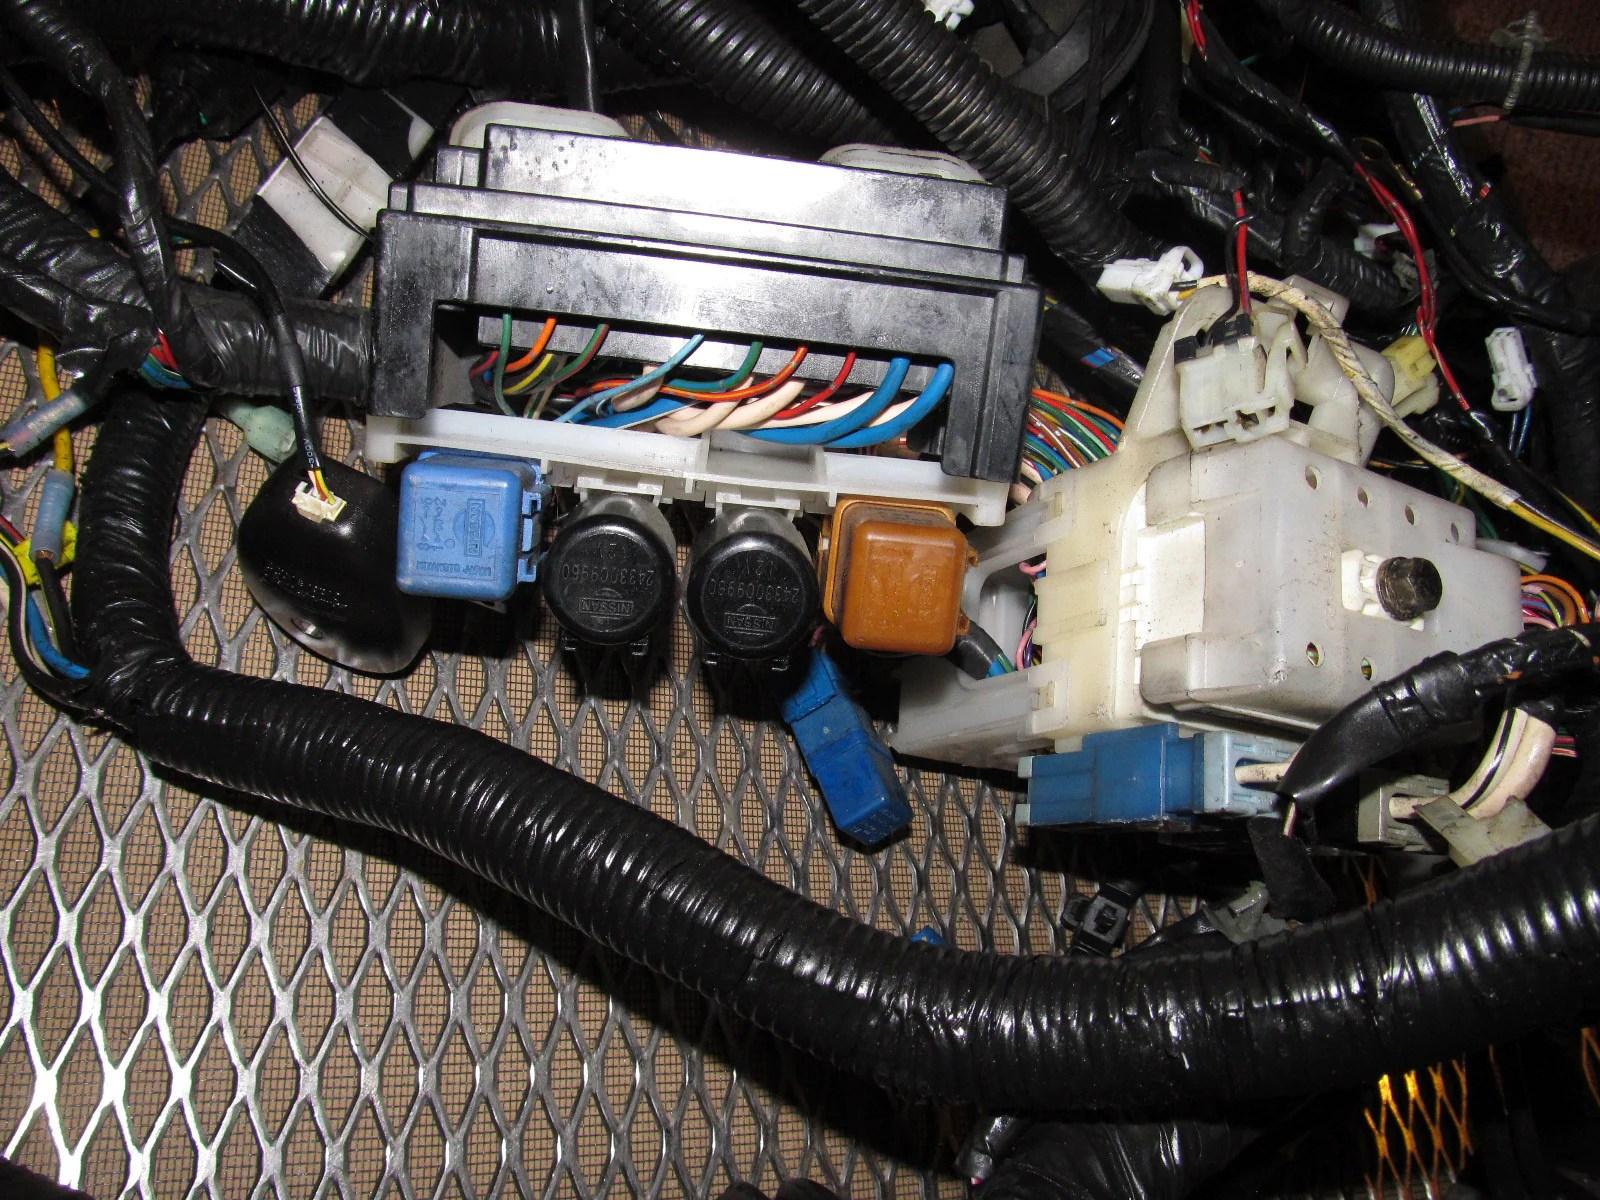 1991 nissan 240sx ignition wiring diagram radiator electric fan interior fuse box auto